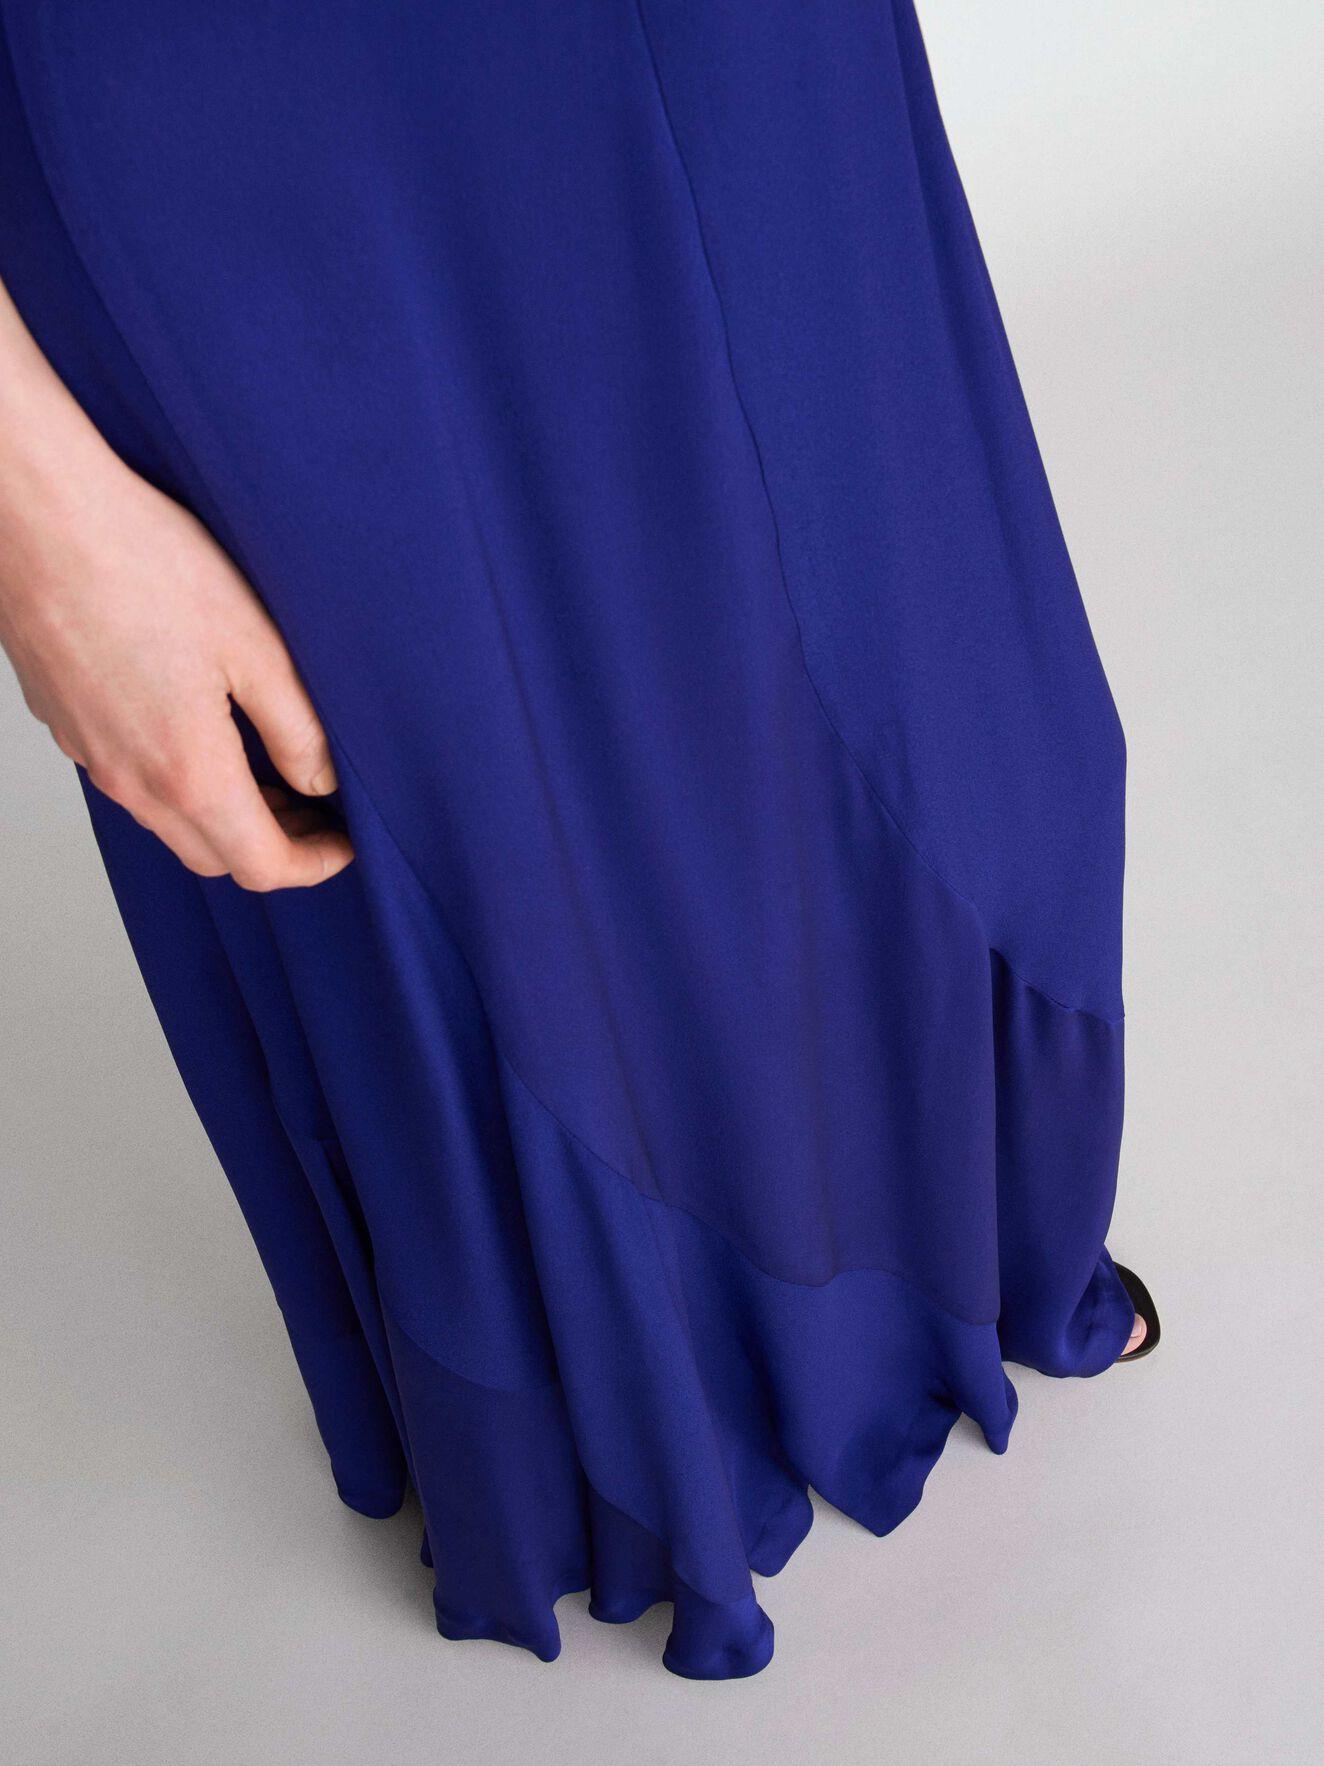 Iru Skirt in Deep Ocean Blue from Tiger of Sweden